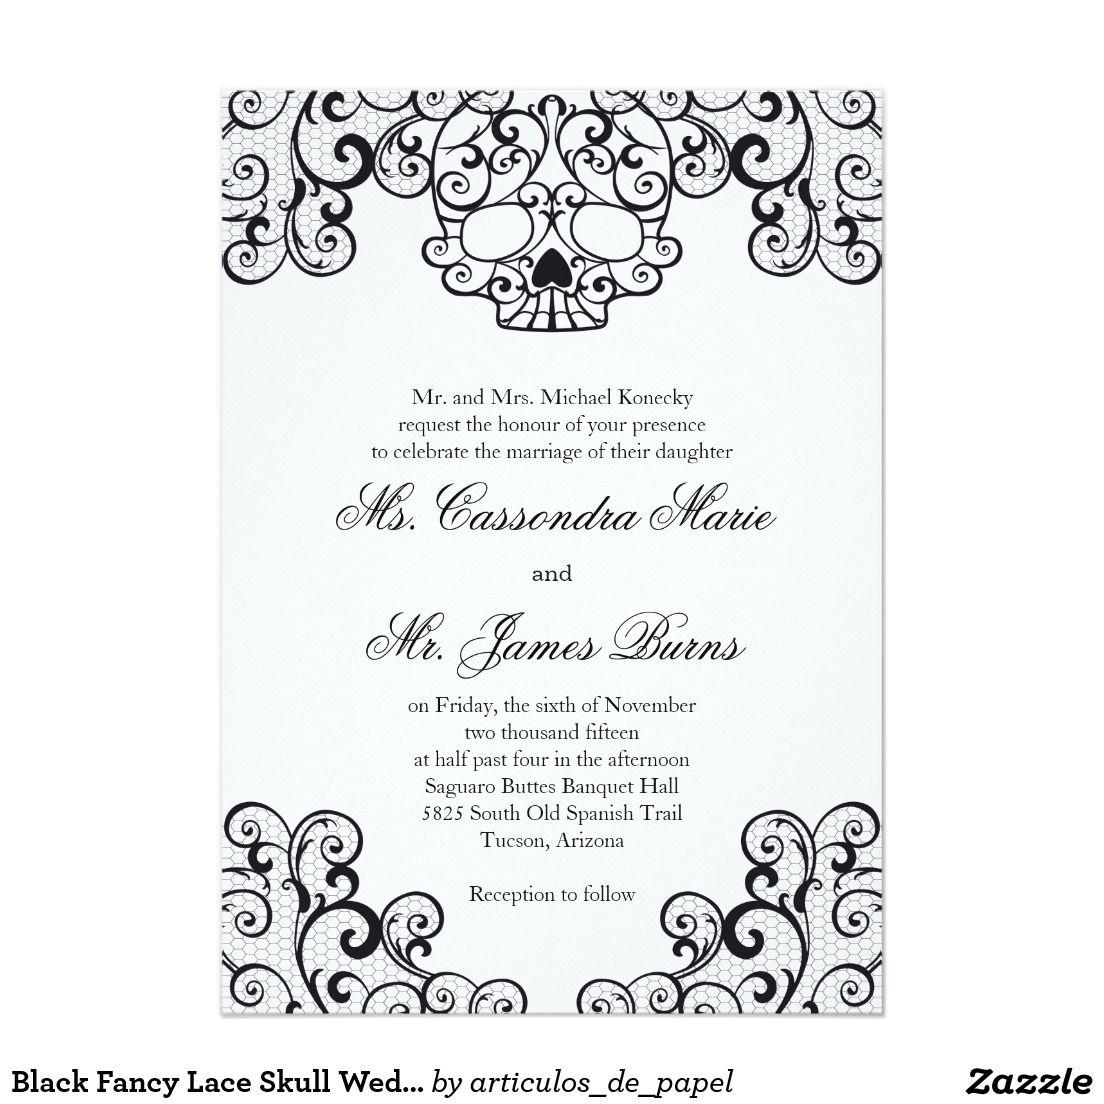 Black Fancy Lace Skull Wedding Invitation | Invitations | Pinterest ...